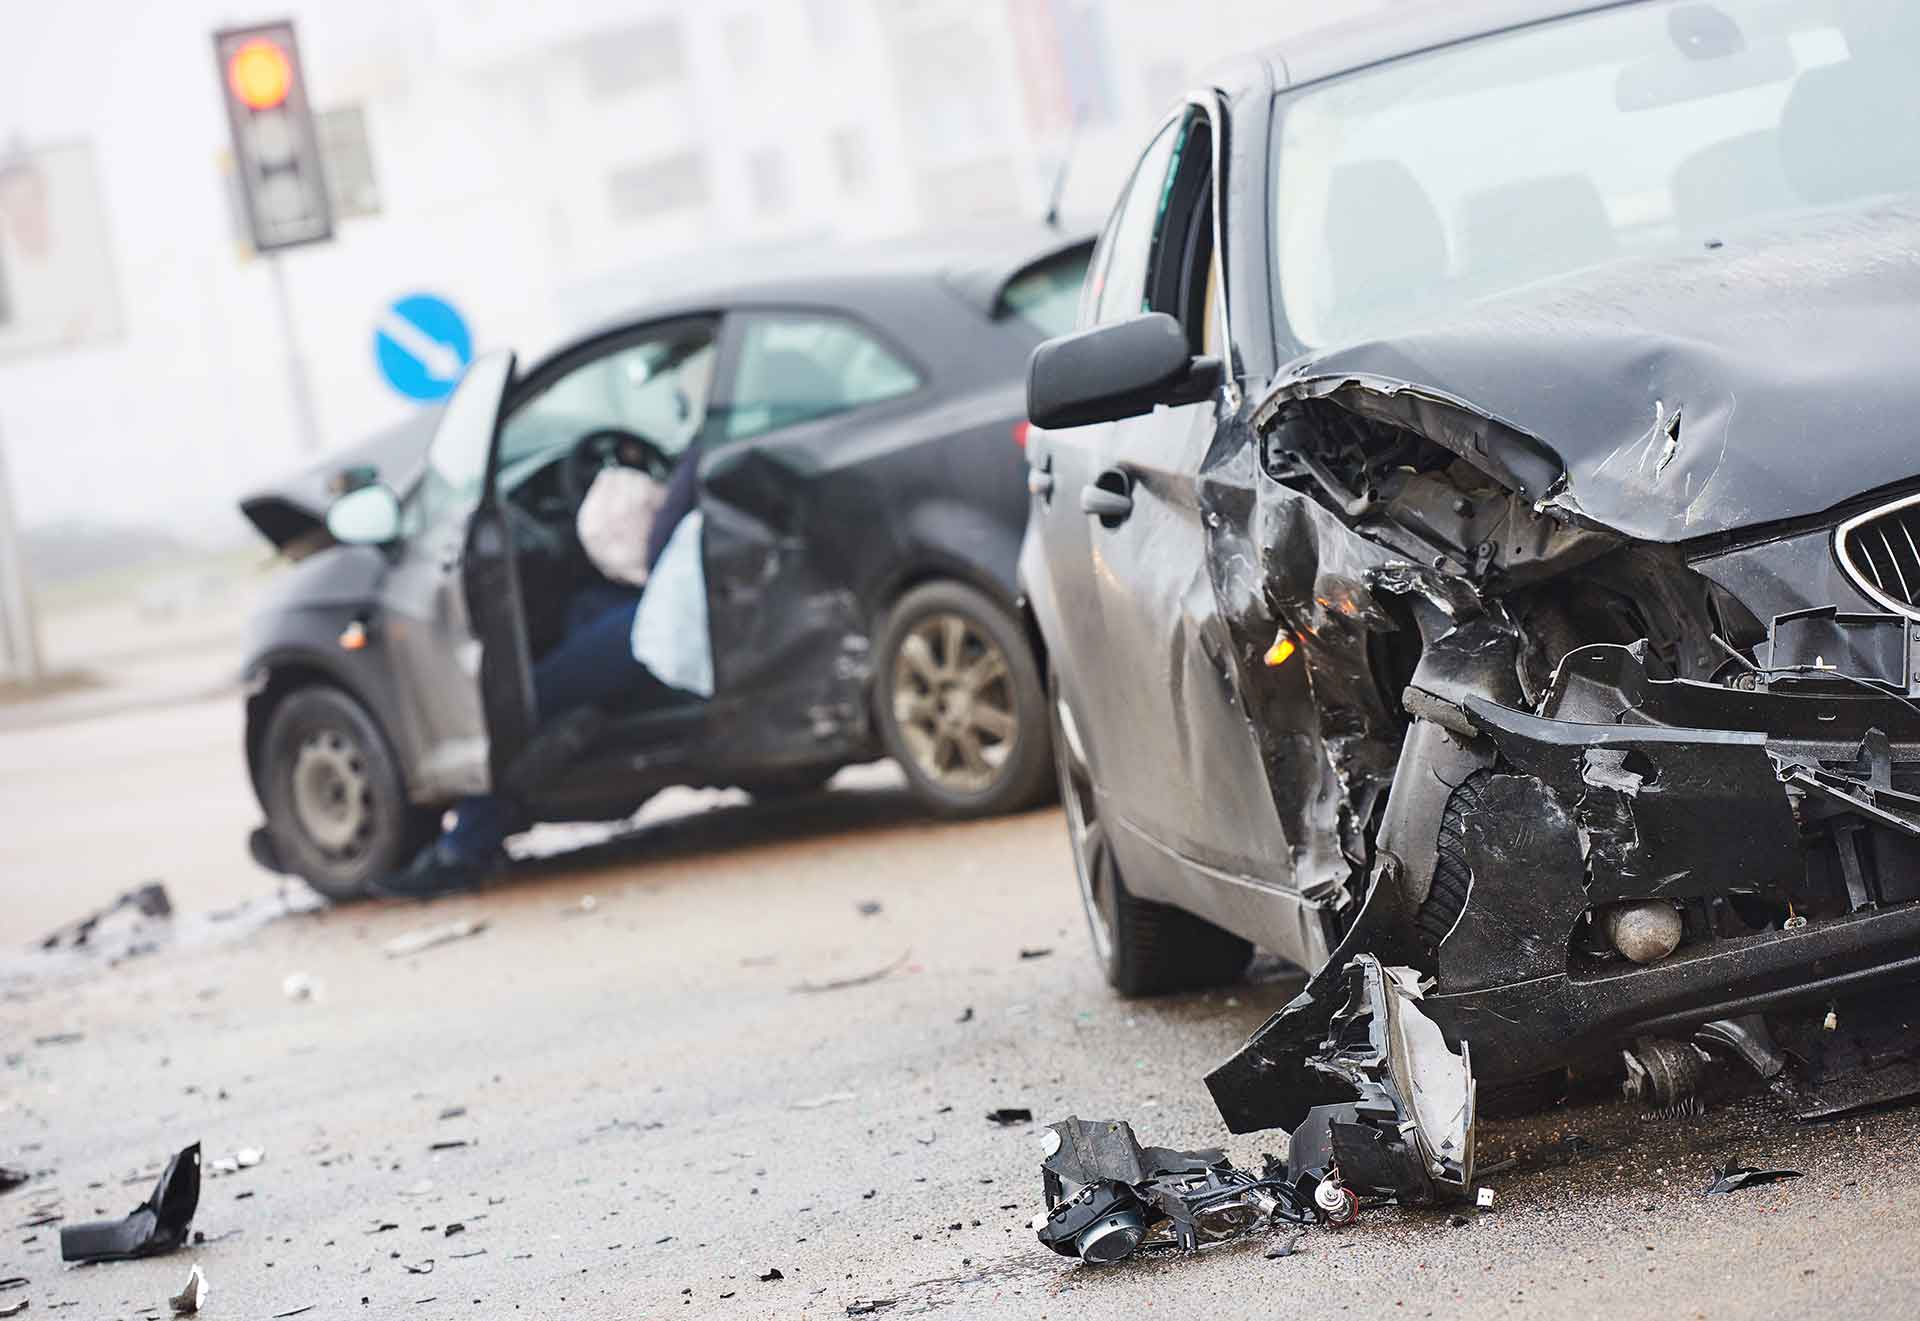 Spraakmakende strafzaken - Fataal auto-ongeval